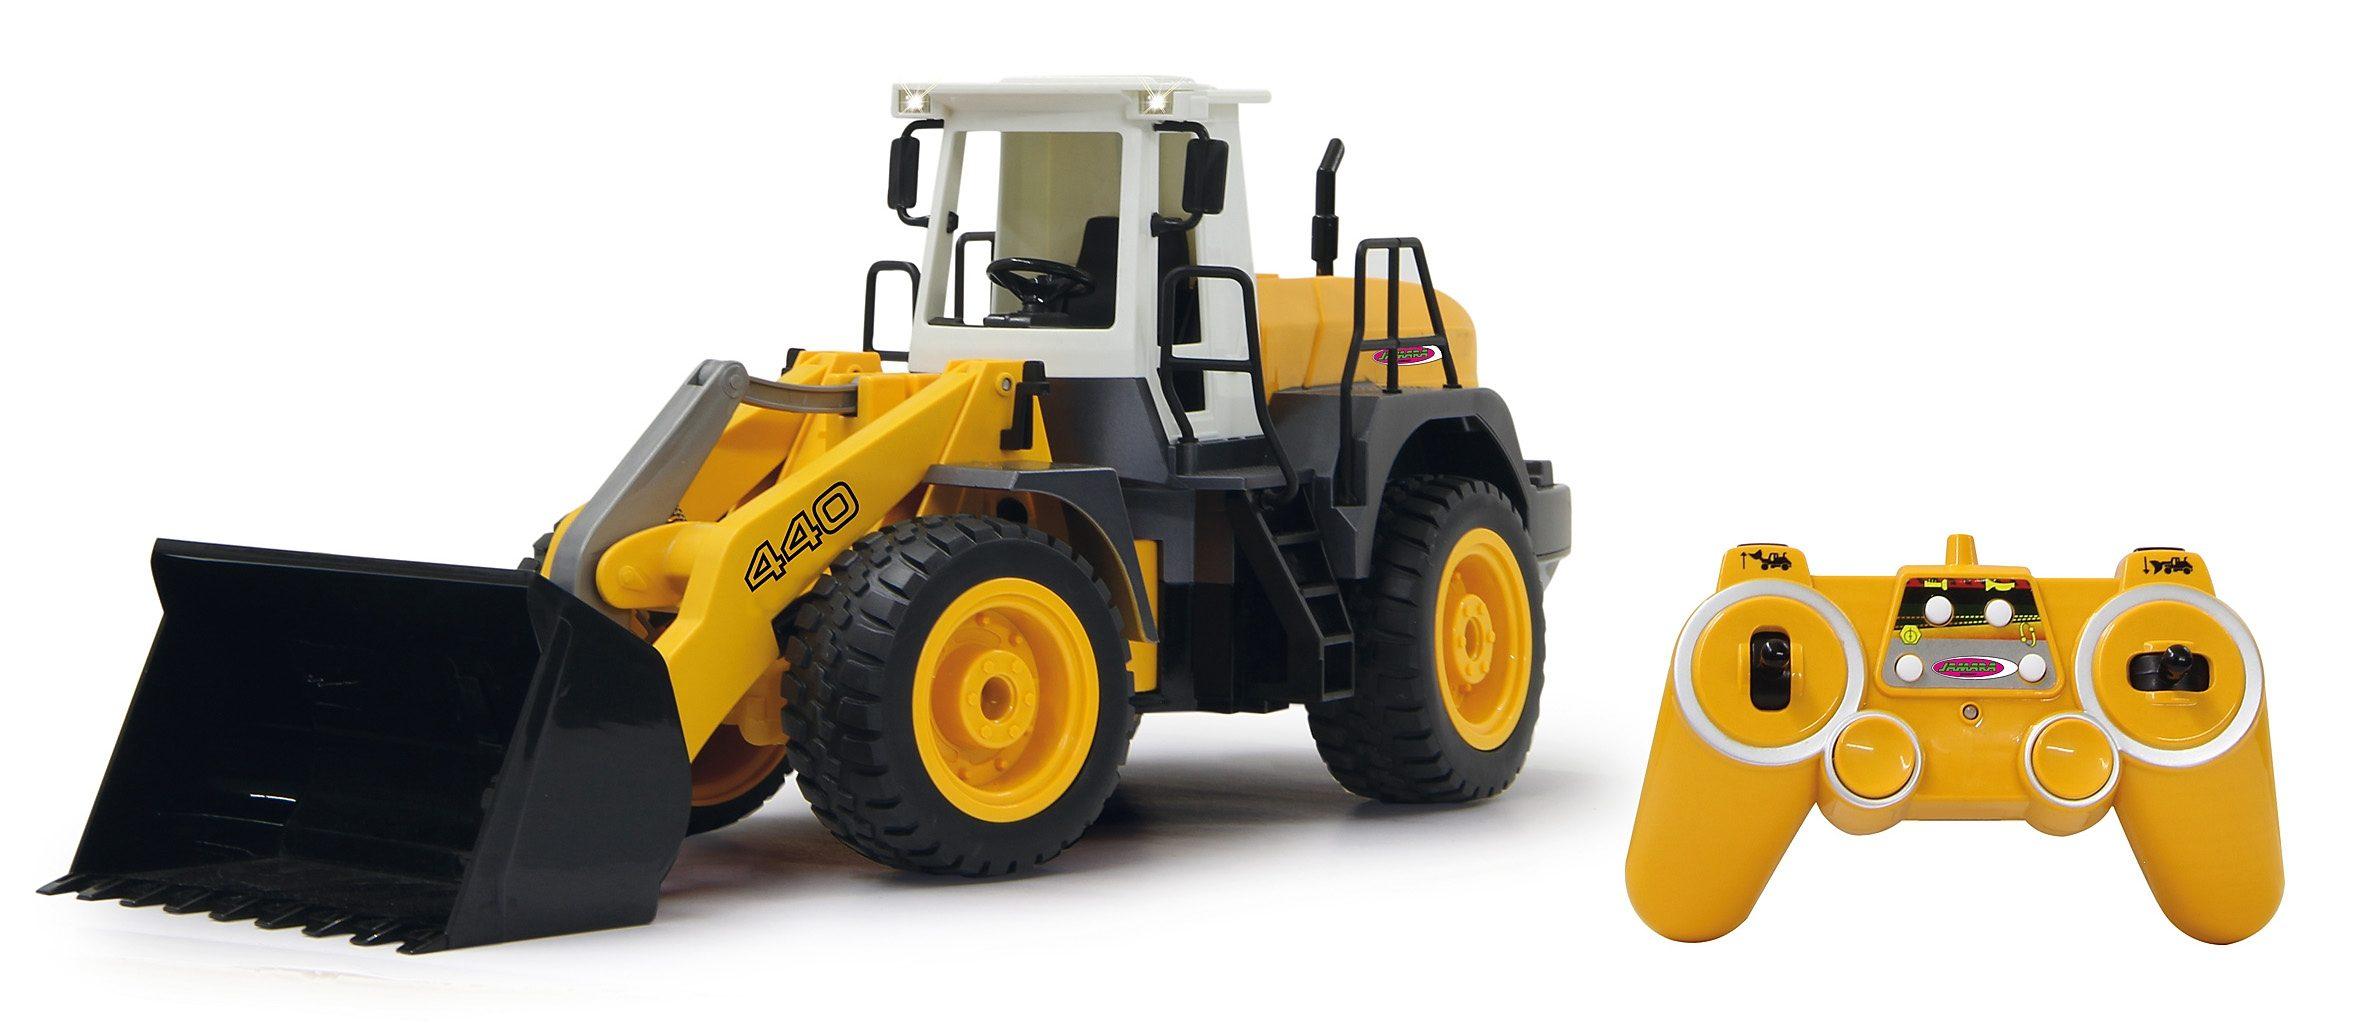 JAMARA RC Bagger mit Motorsound, Maßstab 1:20, »Radlader 440 2,4GHz«